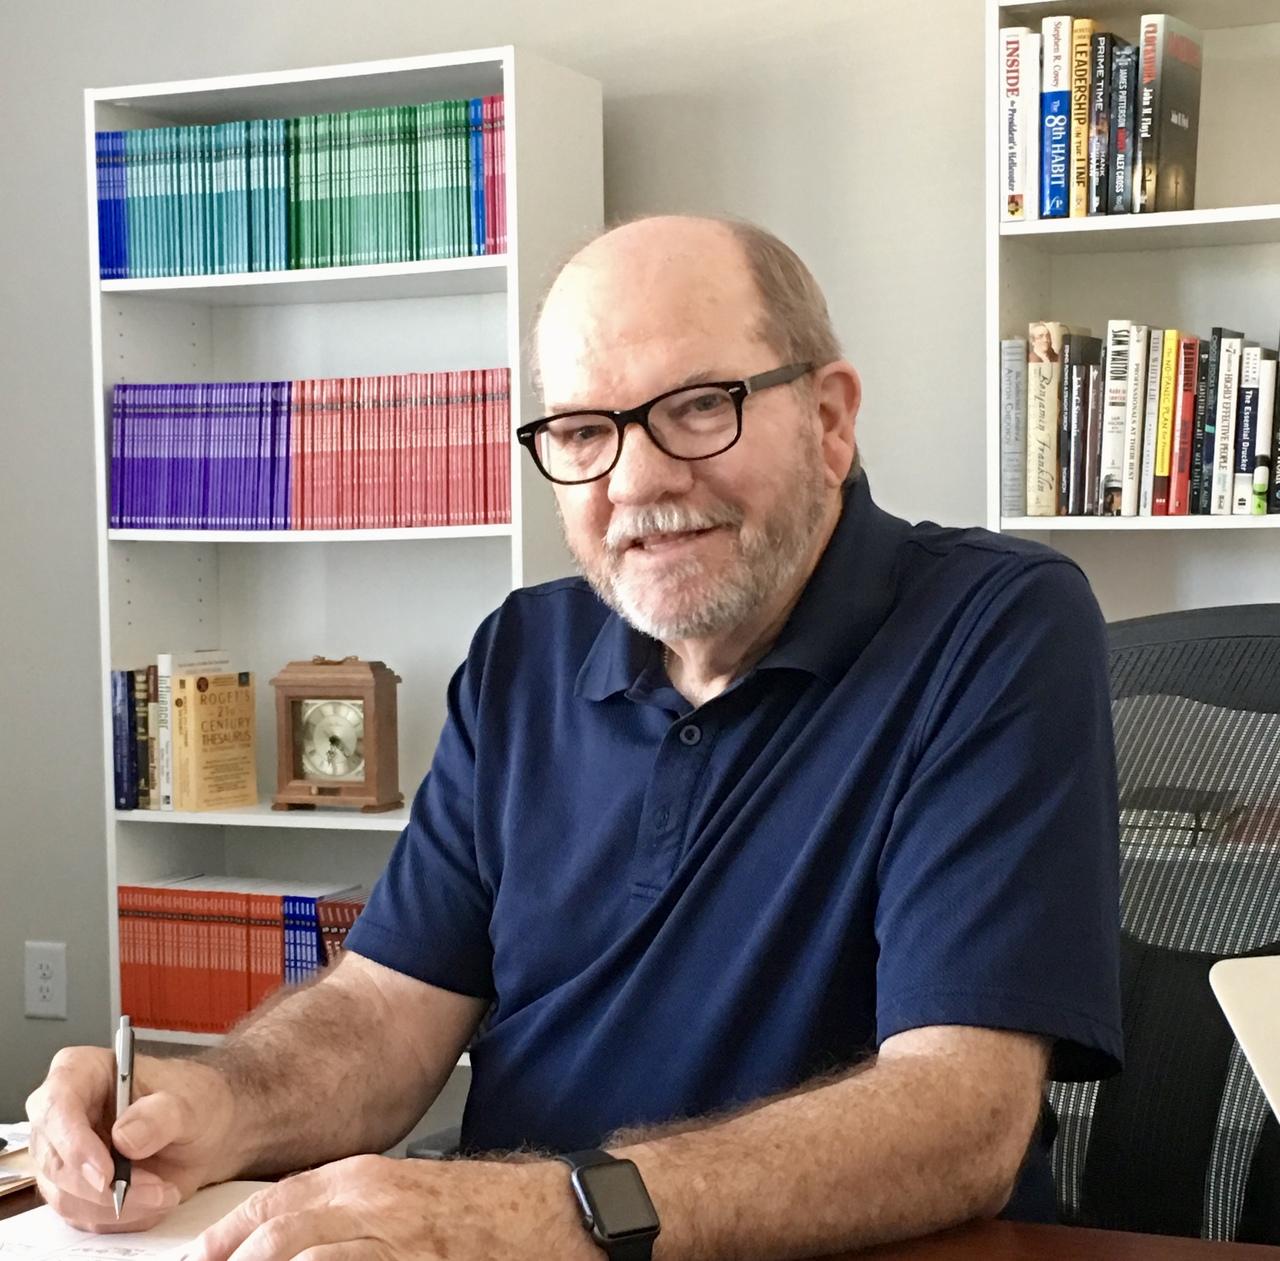 Phil hardwick at desk sep 2019